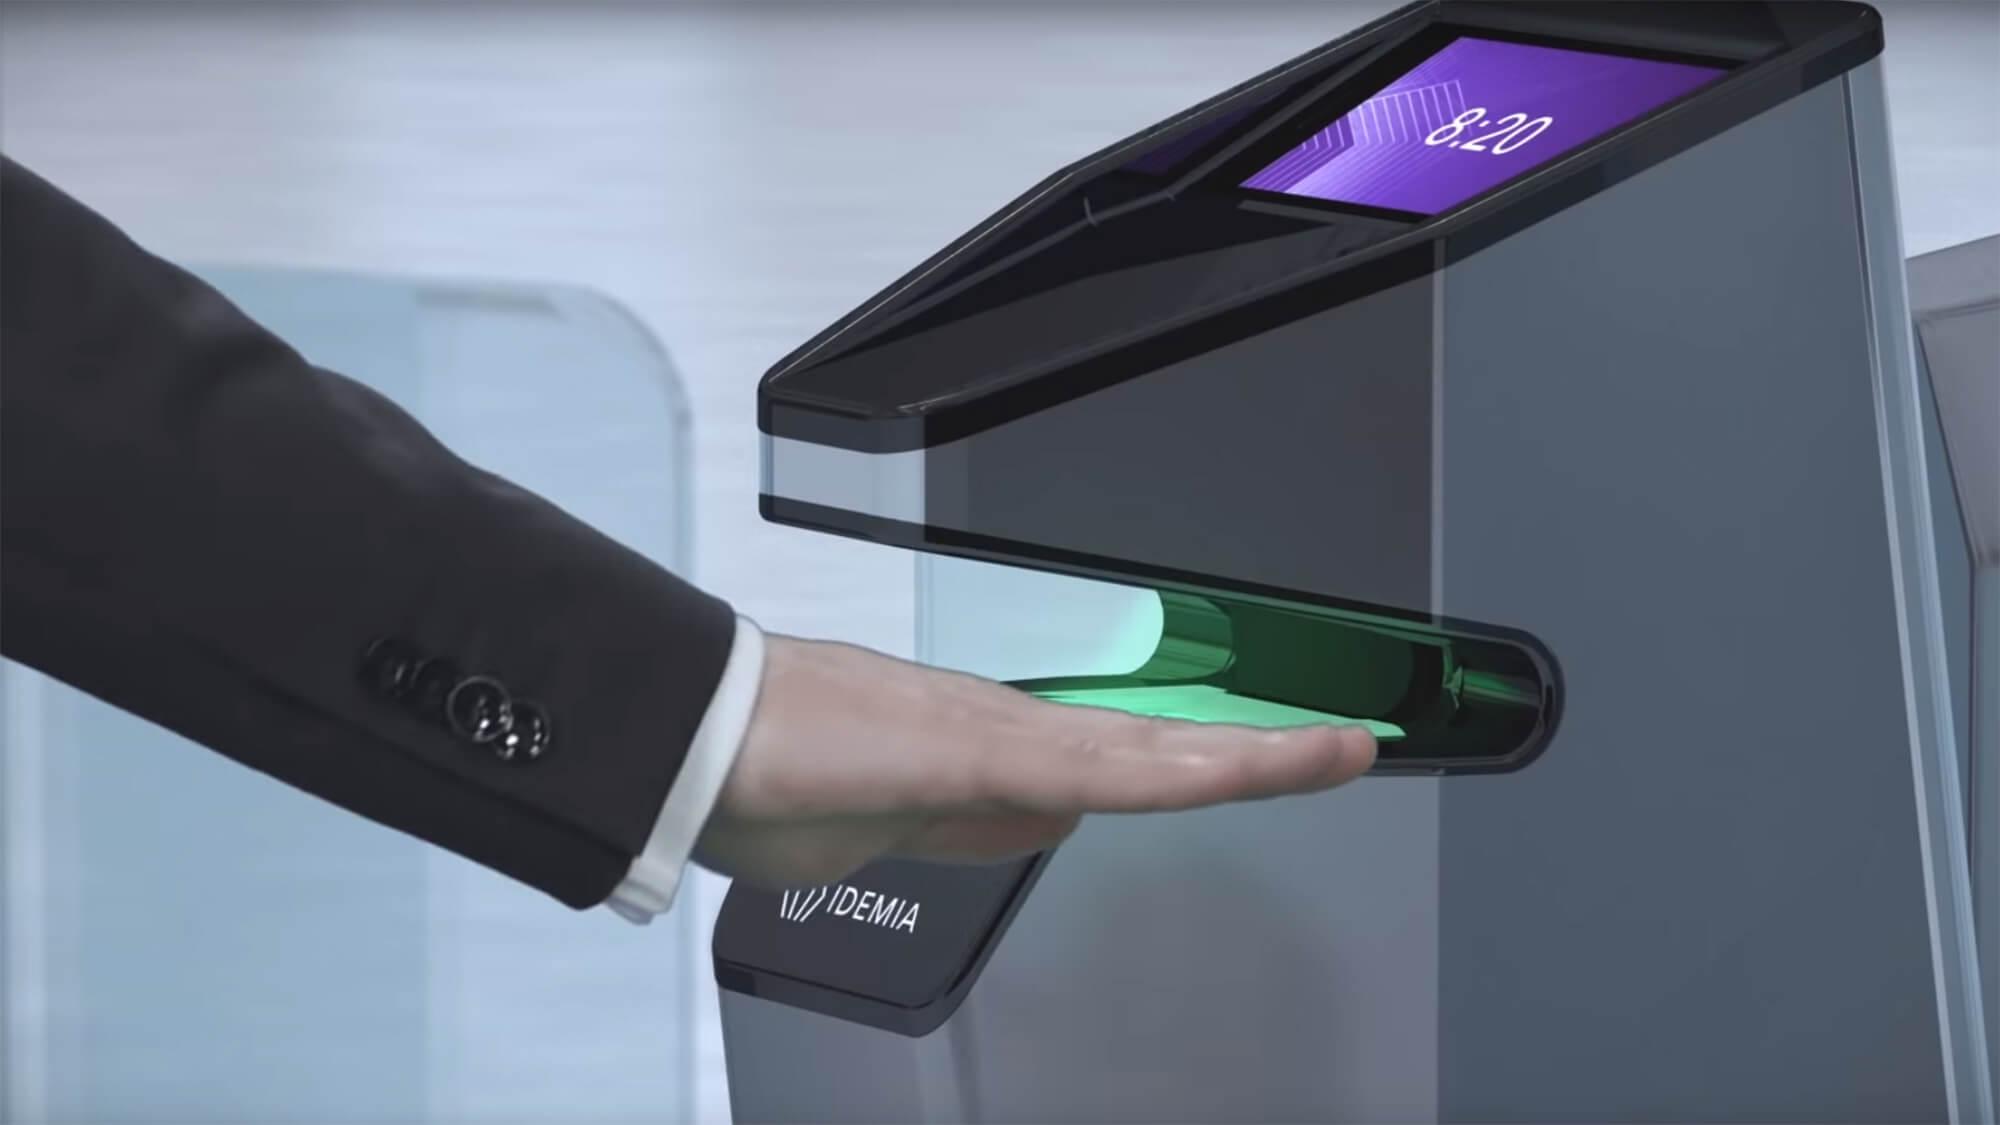 IDEMIA fingerprint scanner system in UAE & Qatar